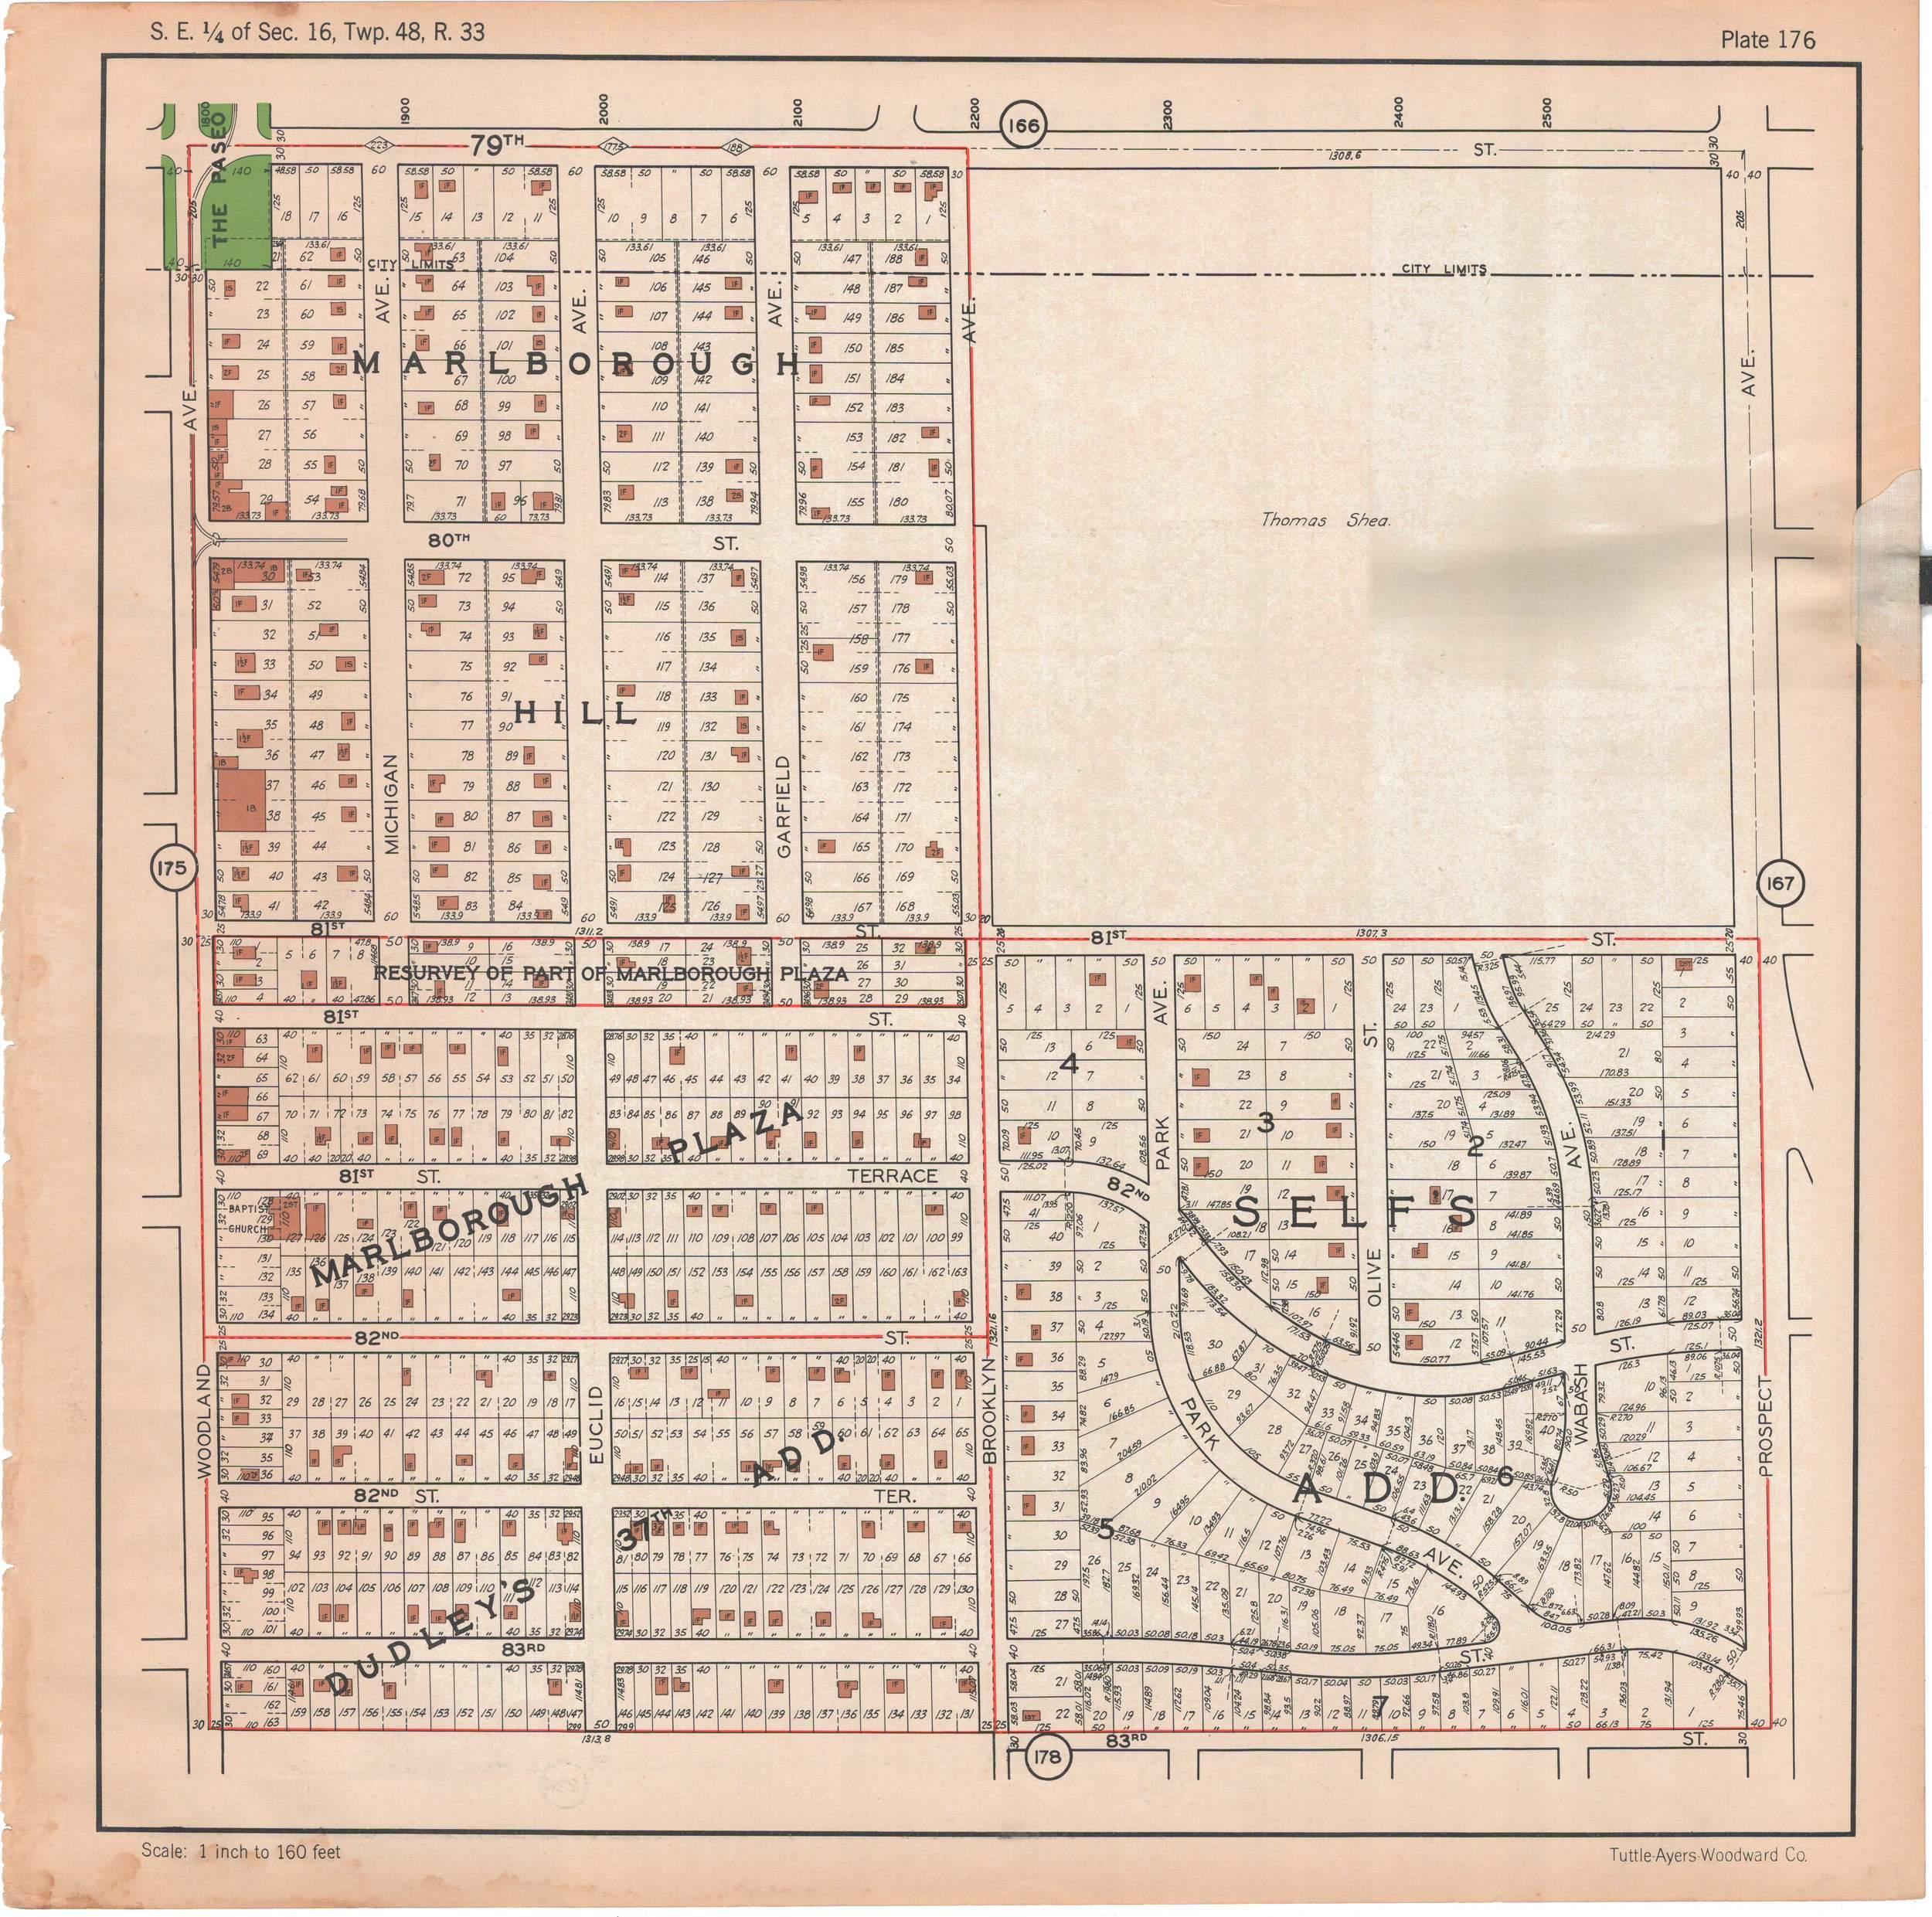 1925 TUTTLE_AYERS_Plate_176.JPG